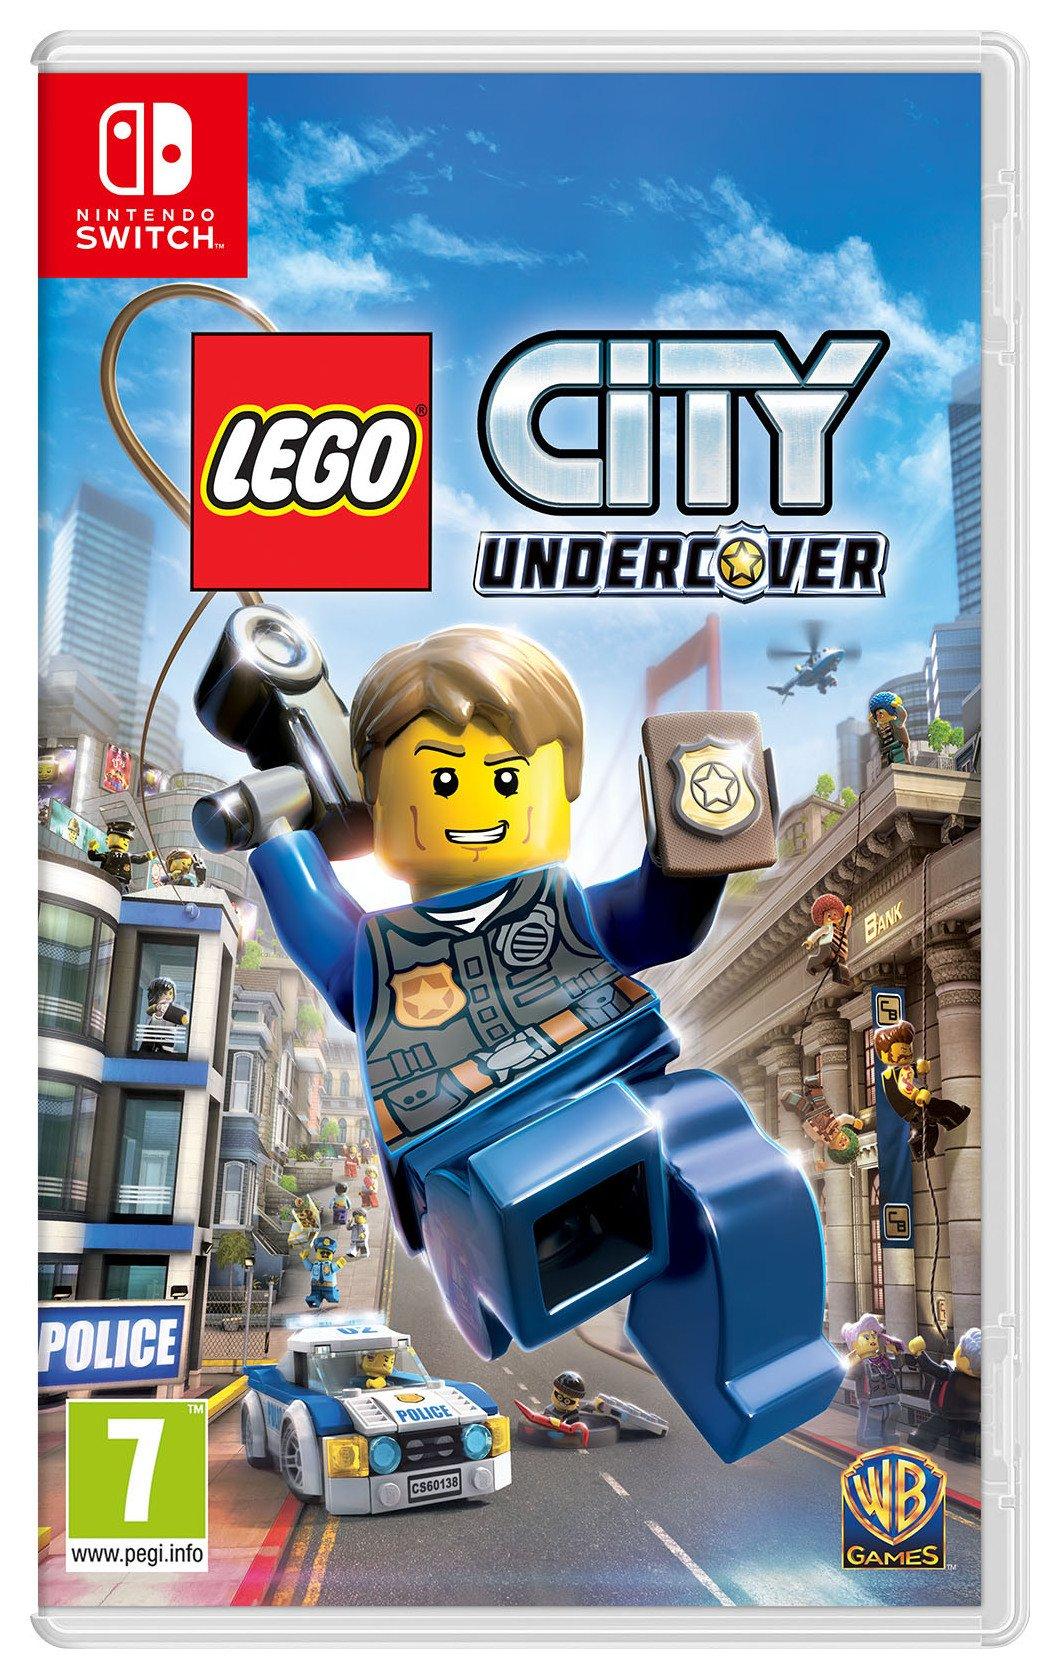 Buy LEGO City Undercover Switch Game | Nintendo Switch games | Argos